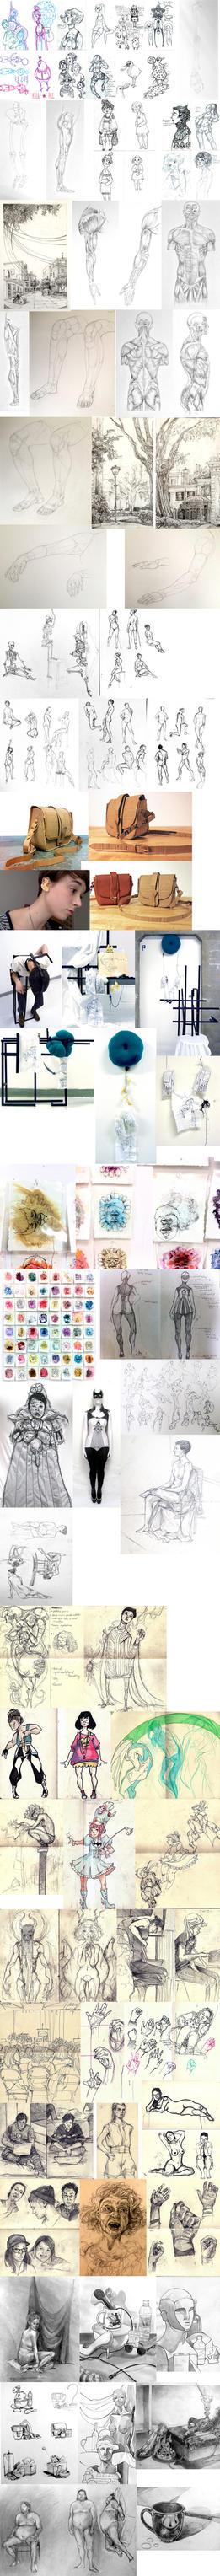 art school/ tumblr sketch dump by bhakri